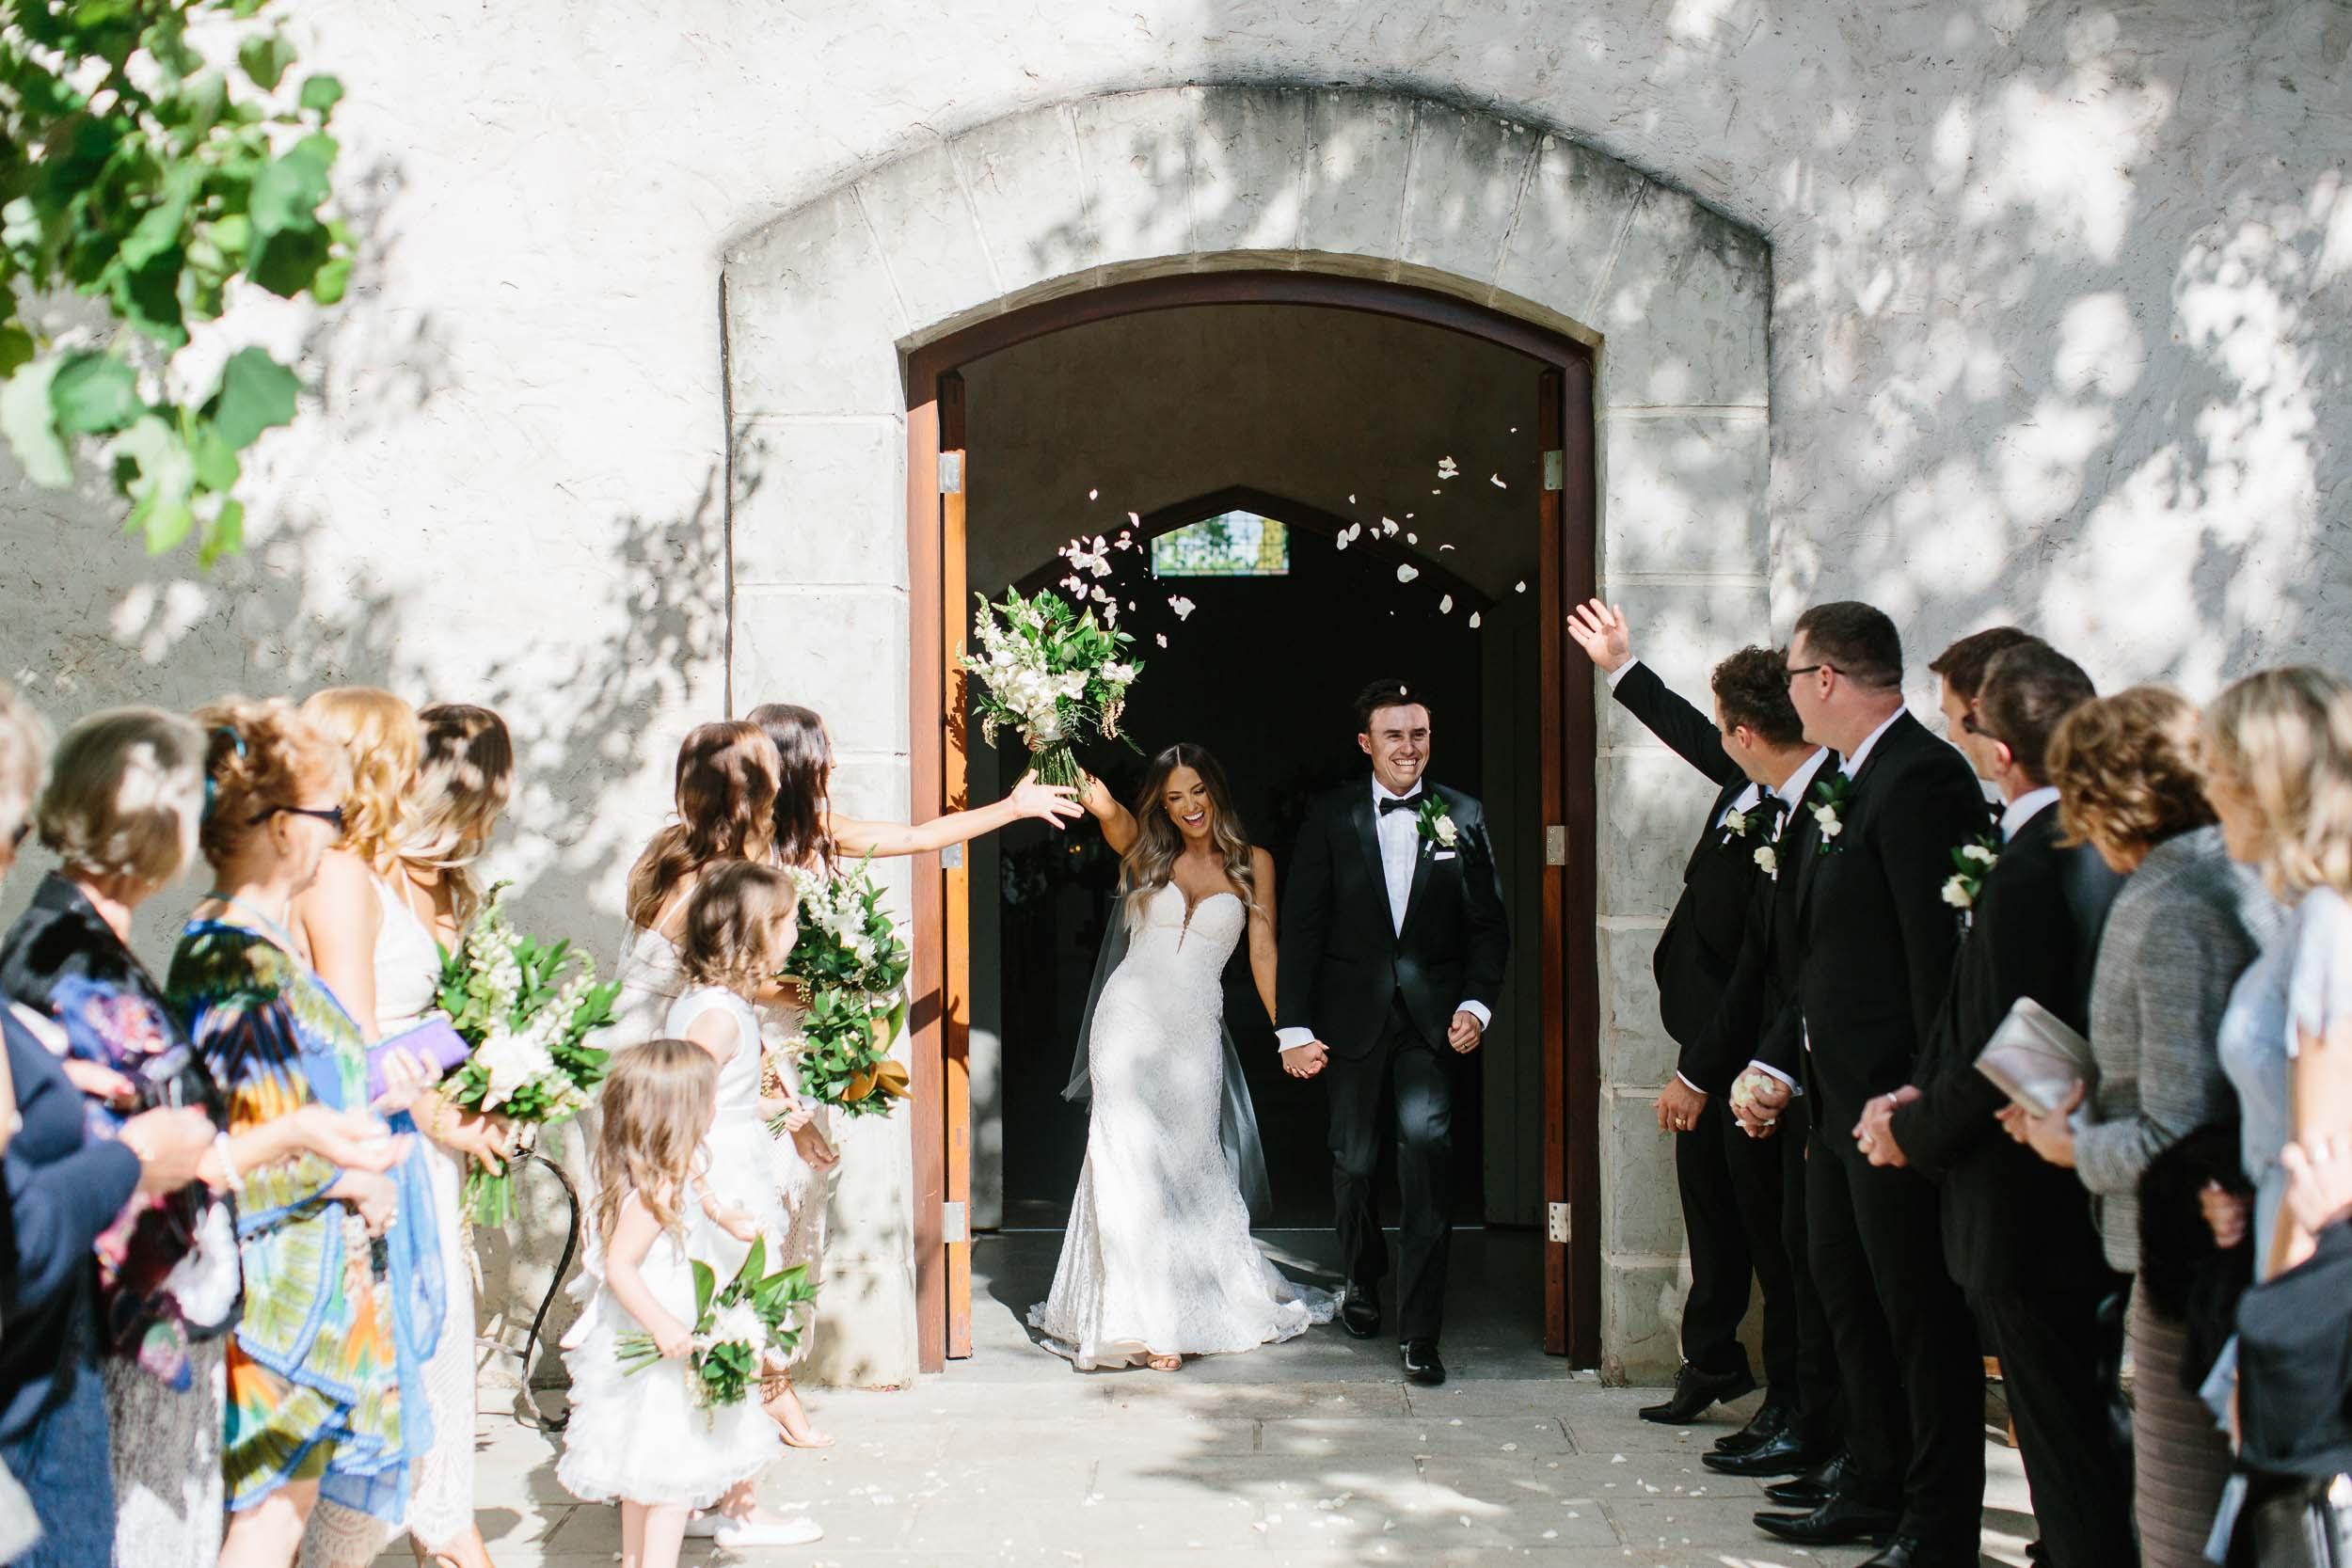 Kas-Richards-Stones-of-the-Yarra-Valley-Wedding-461.jpg